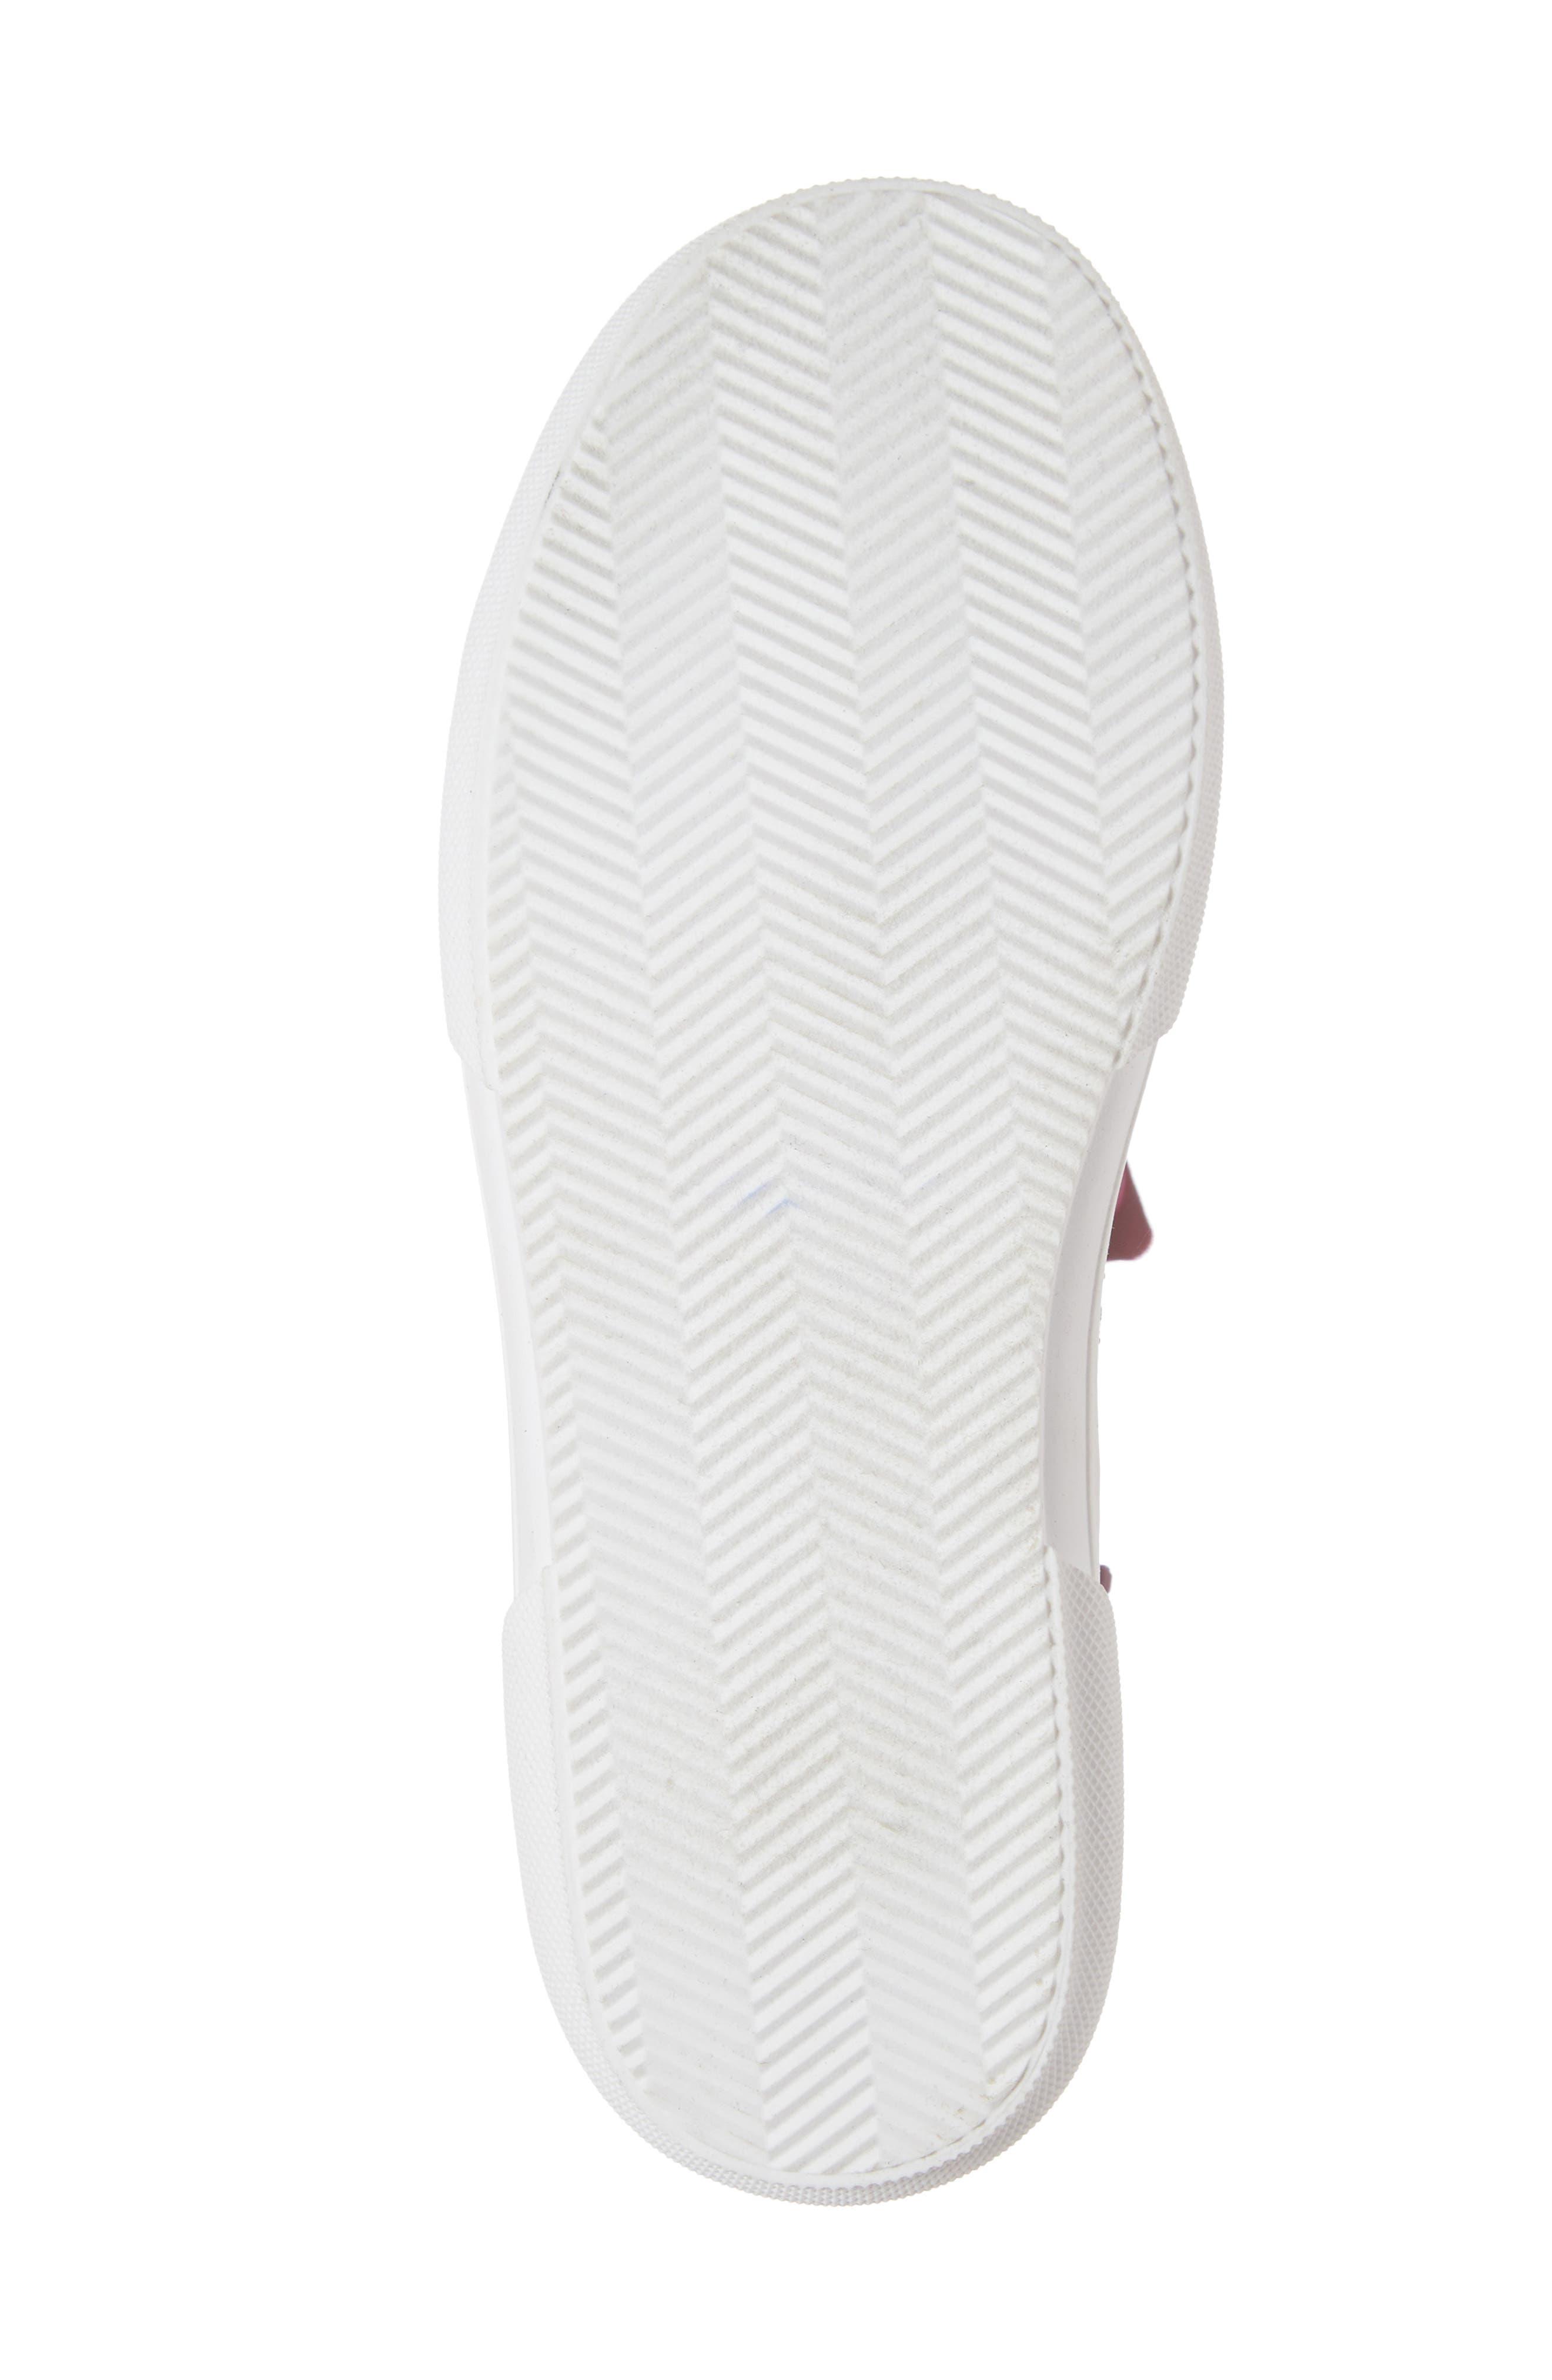 TUCKER + TATE, Skylar Glitter Sneaker, Alternate thumbnail 6, color, FUSCHIA MULTI GLITTER PU